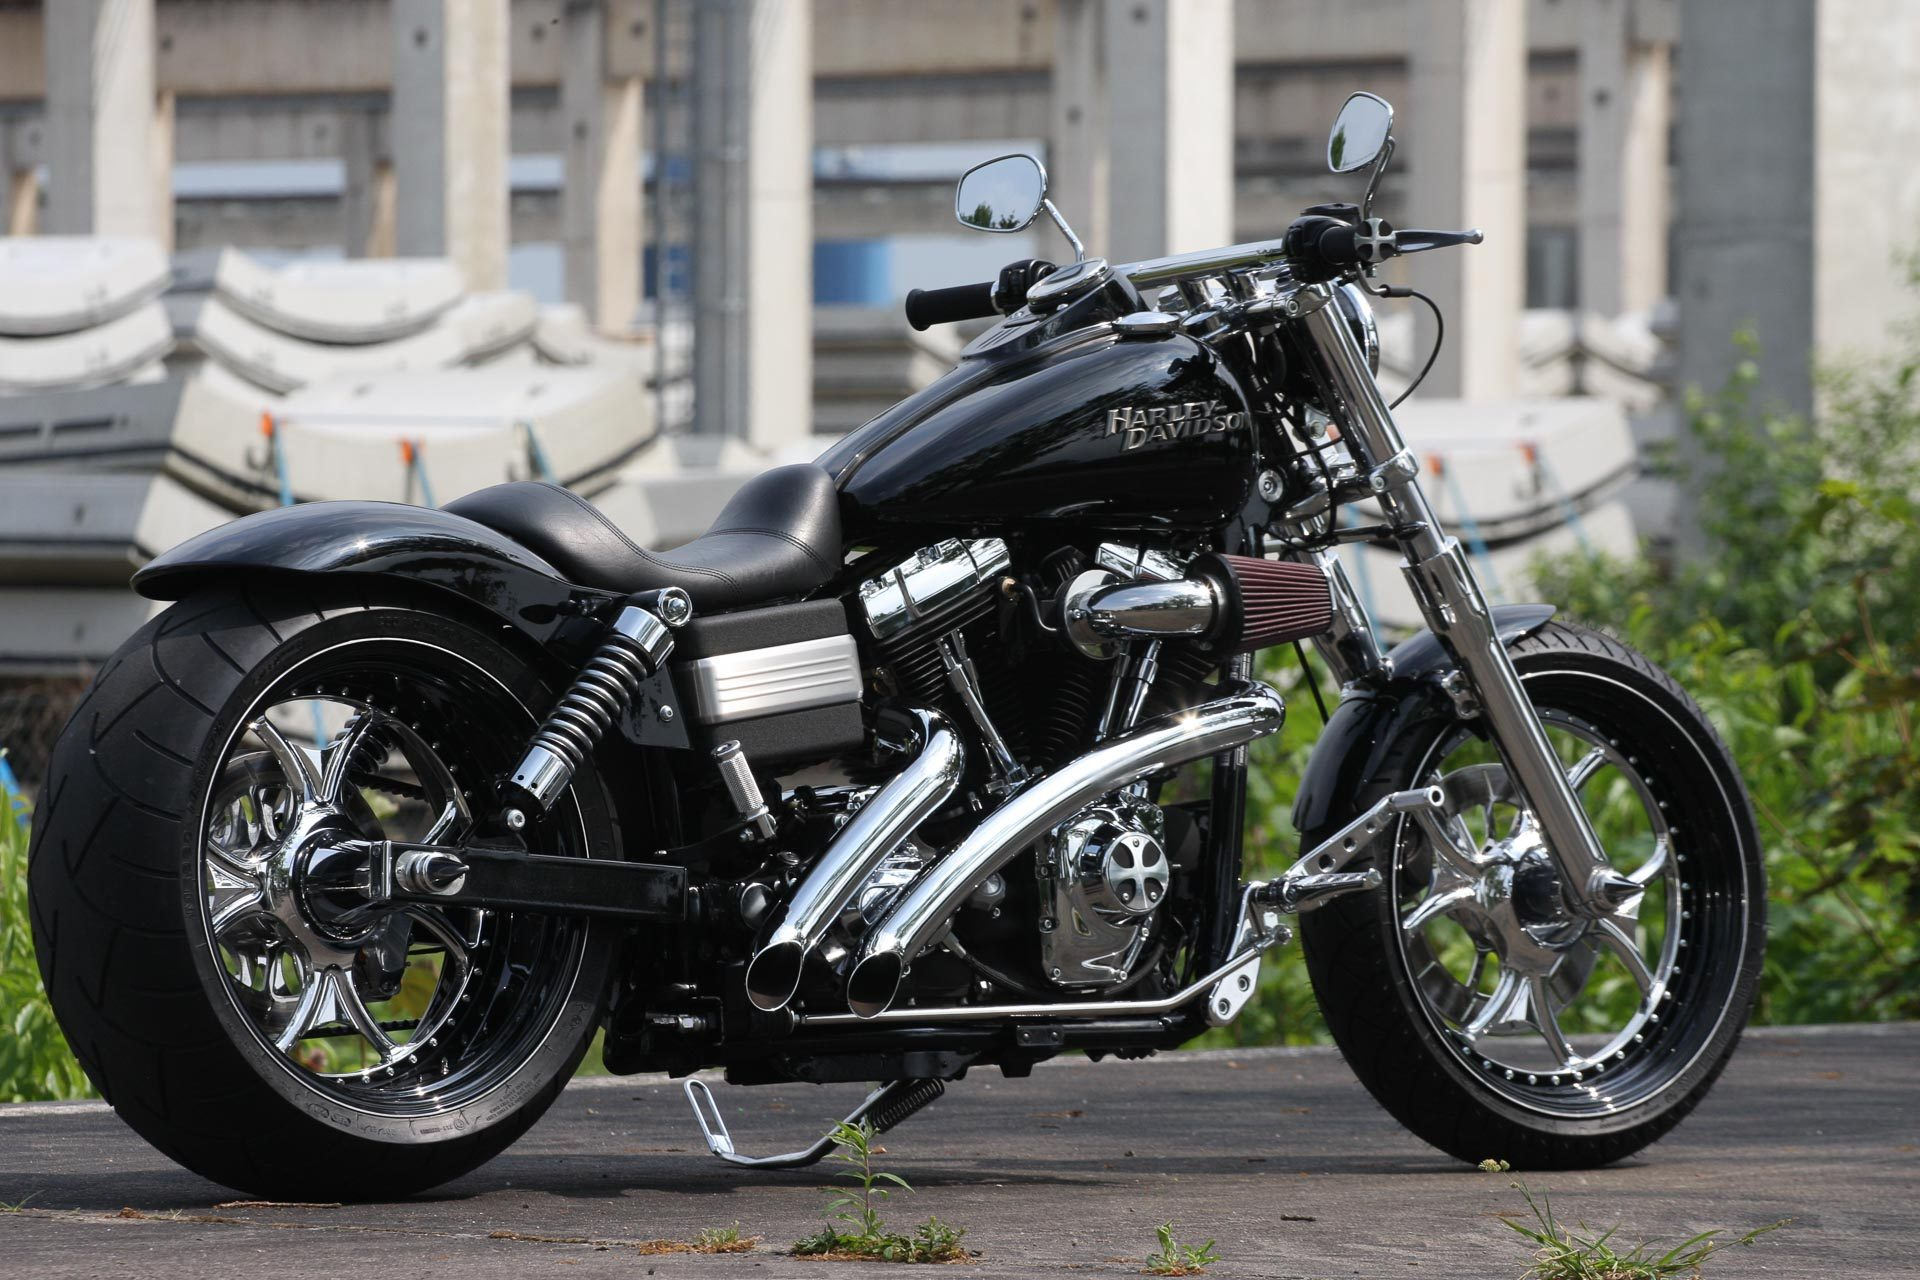 thunderbike gothic h d street bob fxdb custom motorcycle. Black Bedroom Furniture Sets. Home Design Ideas